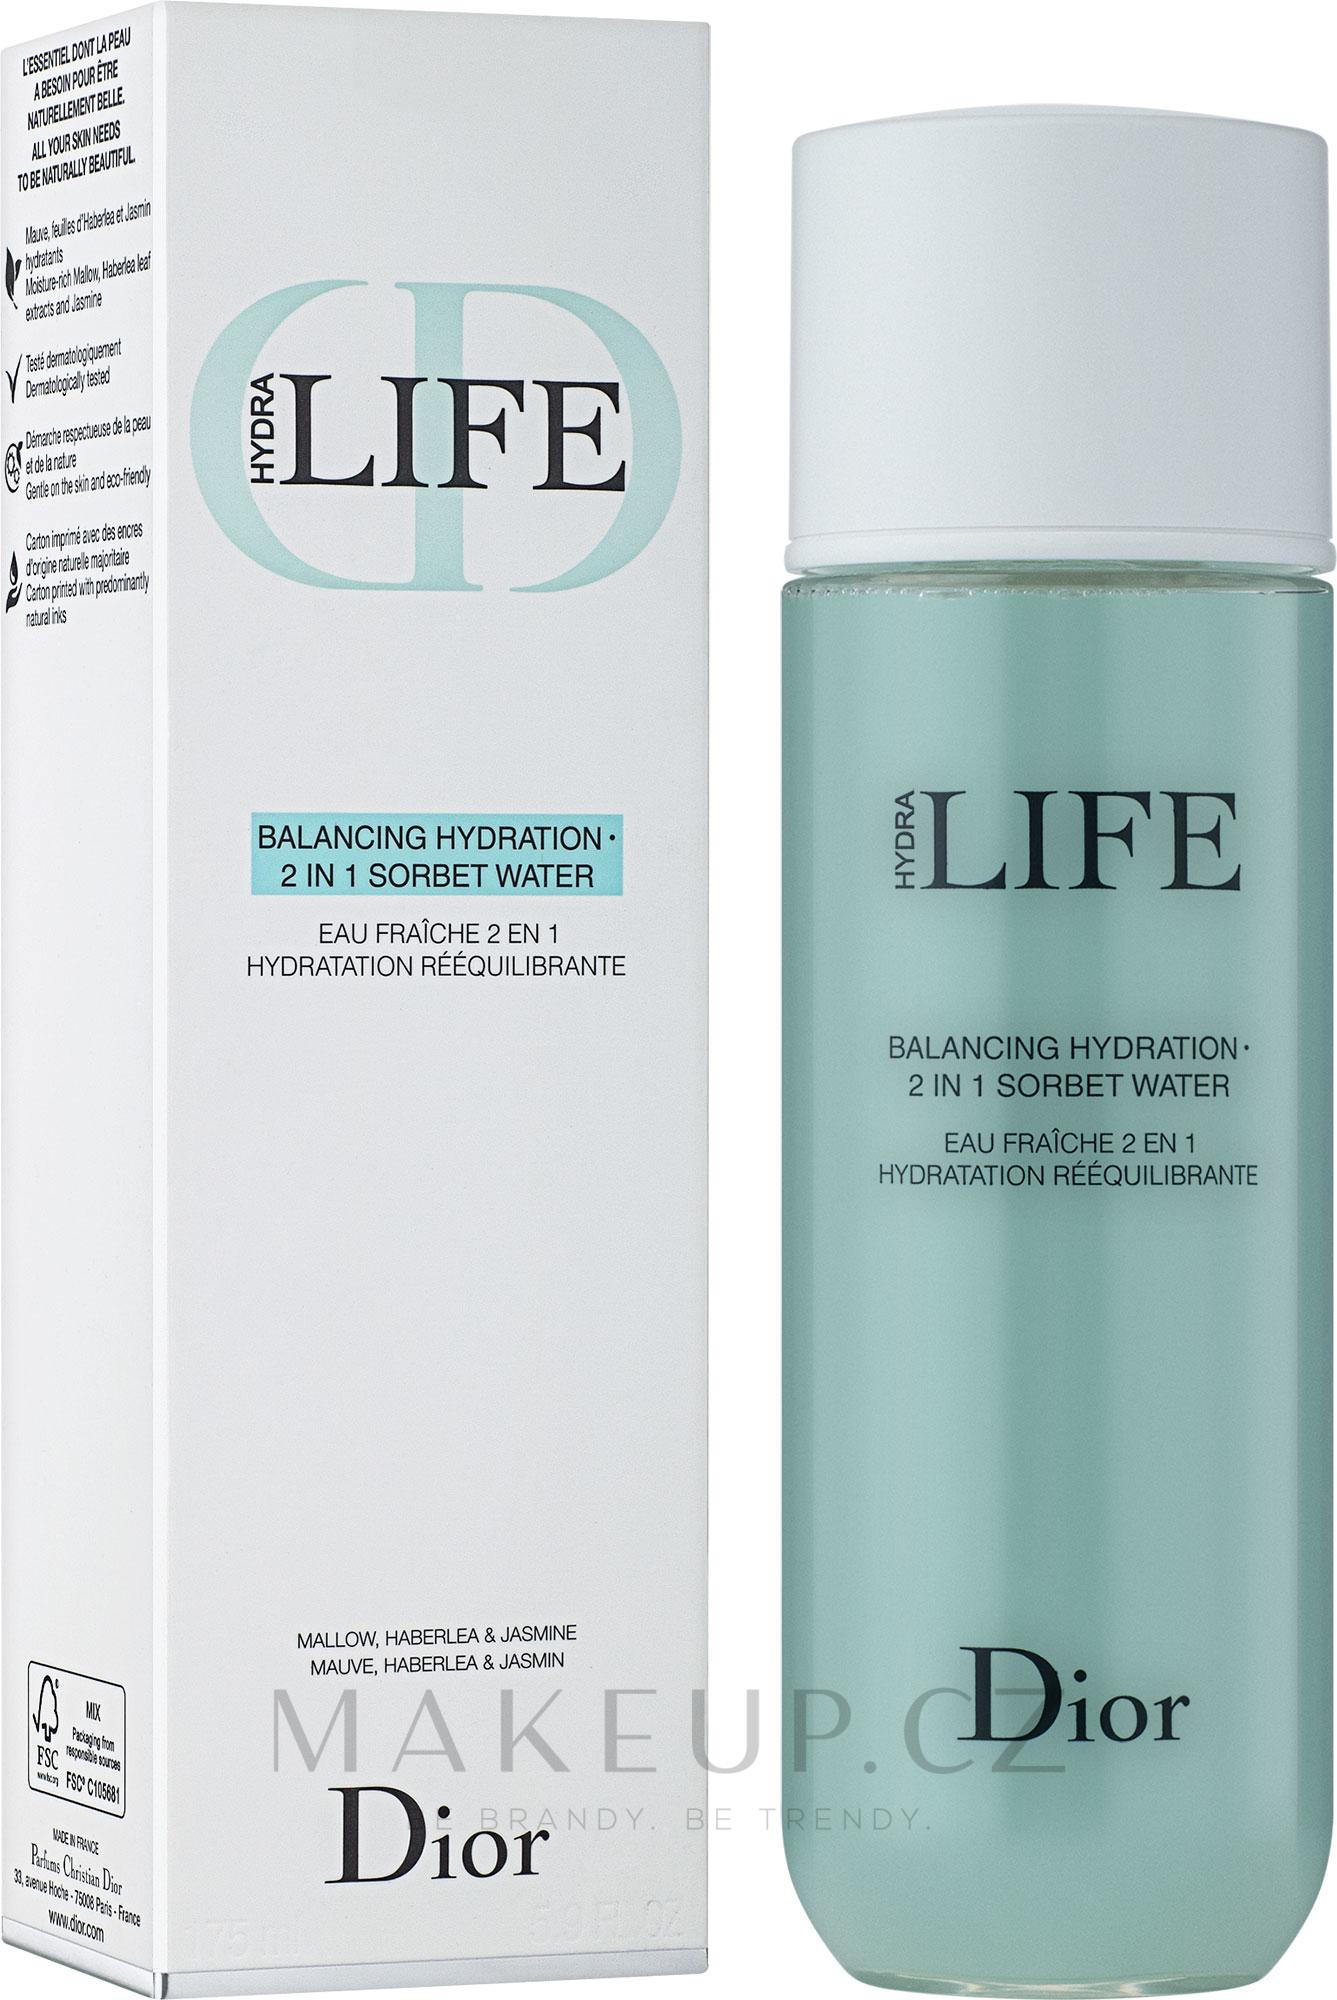 Hydratační sorbetový krém 2-v-1 - Dior Hydra Life Balancing Hydration 2-in-1 Sorbet Water — foto 175 ml